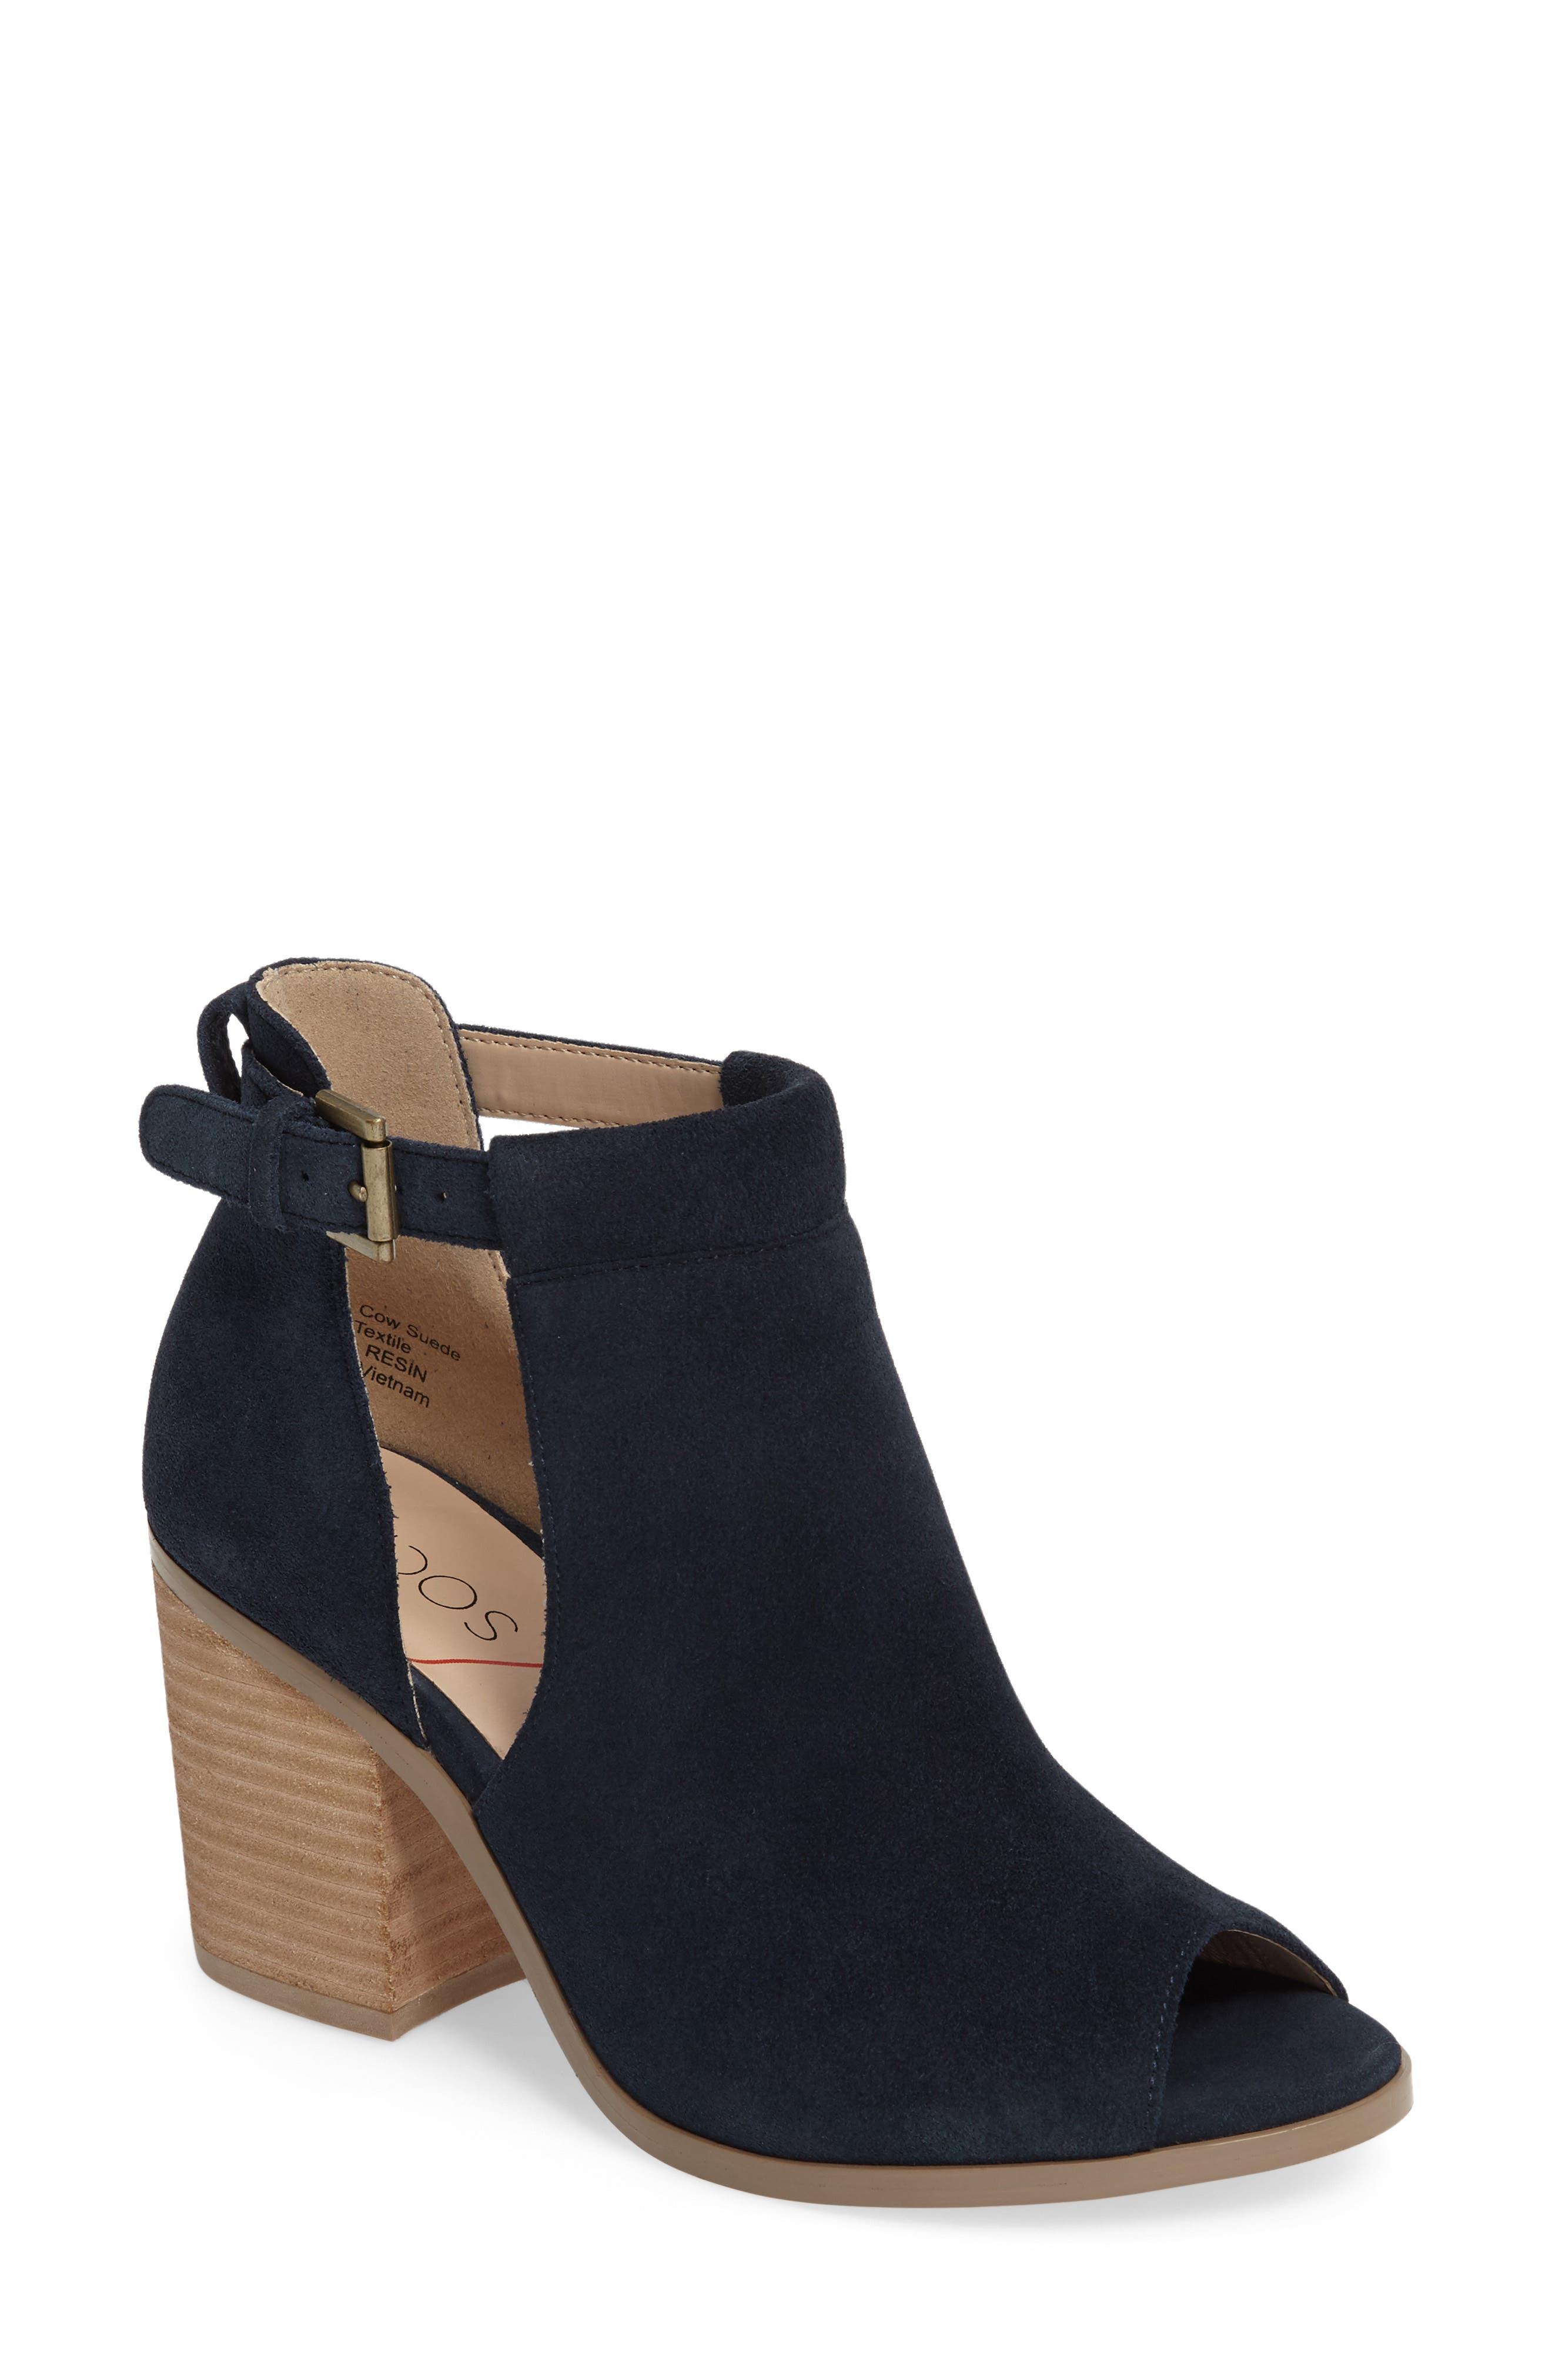 e448e1009 Women s Dress Booties   Ankle Boots